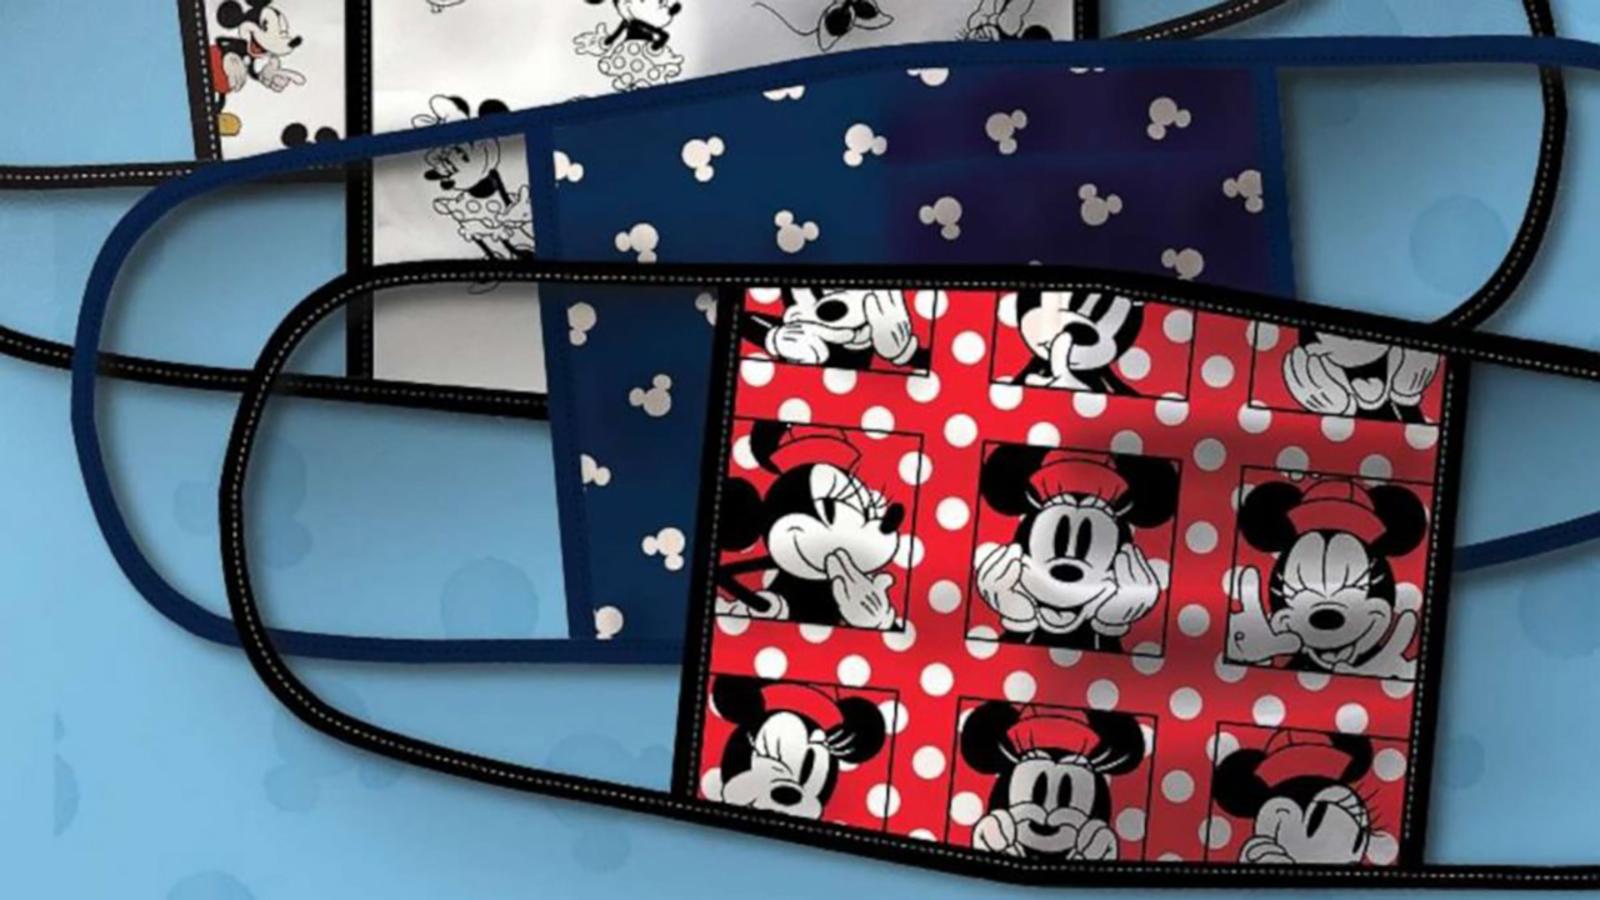 Disney World face coverings